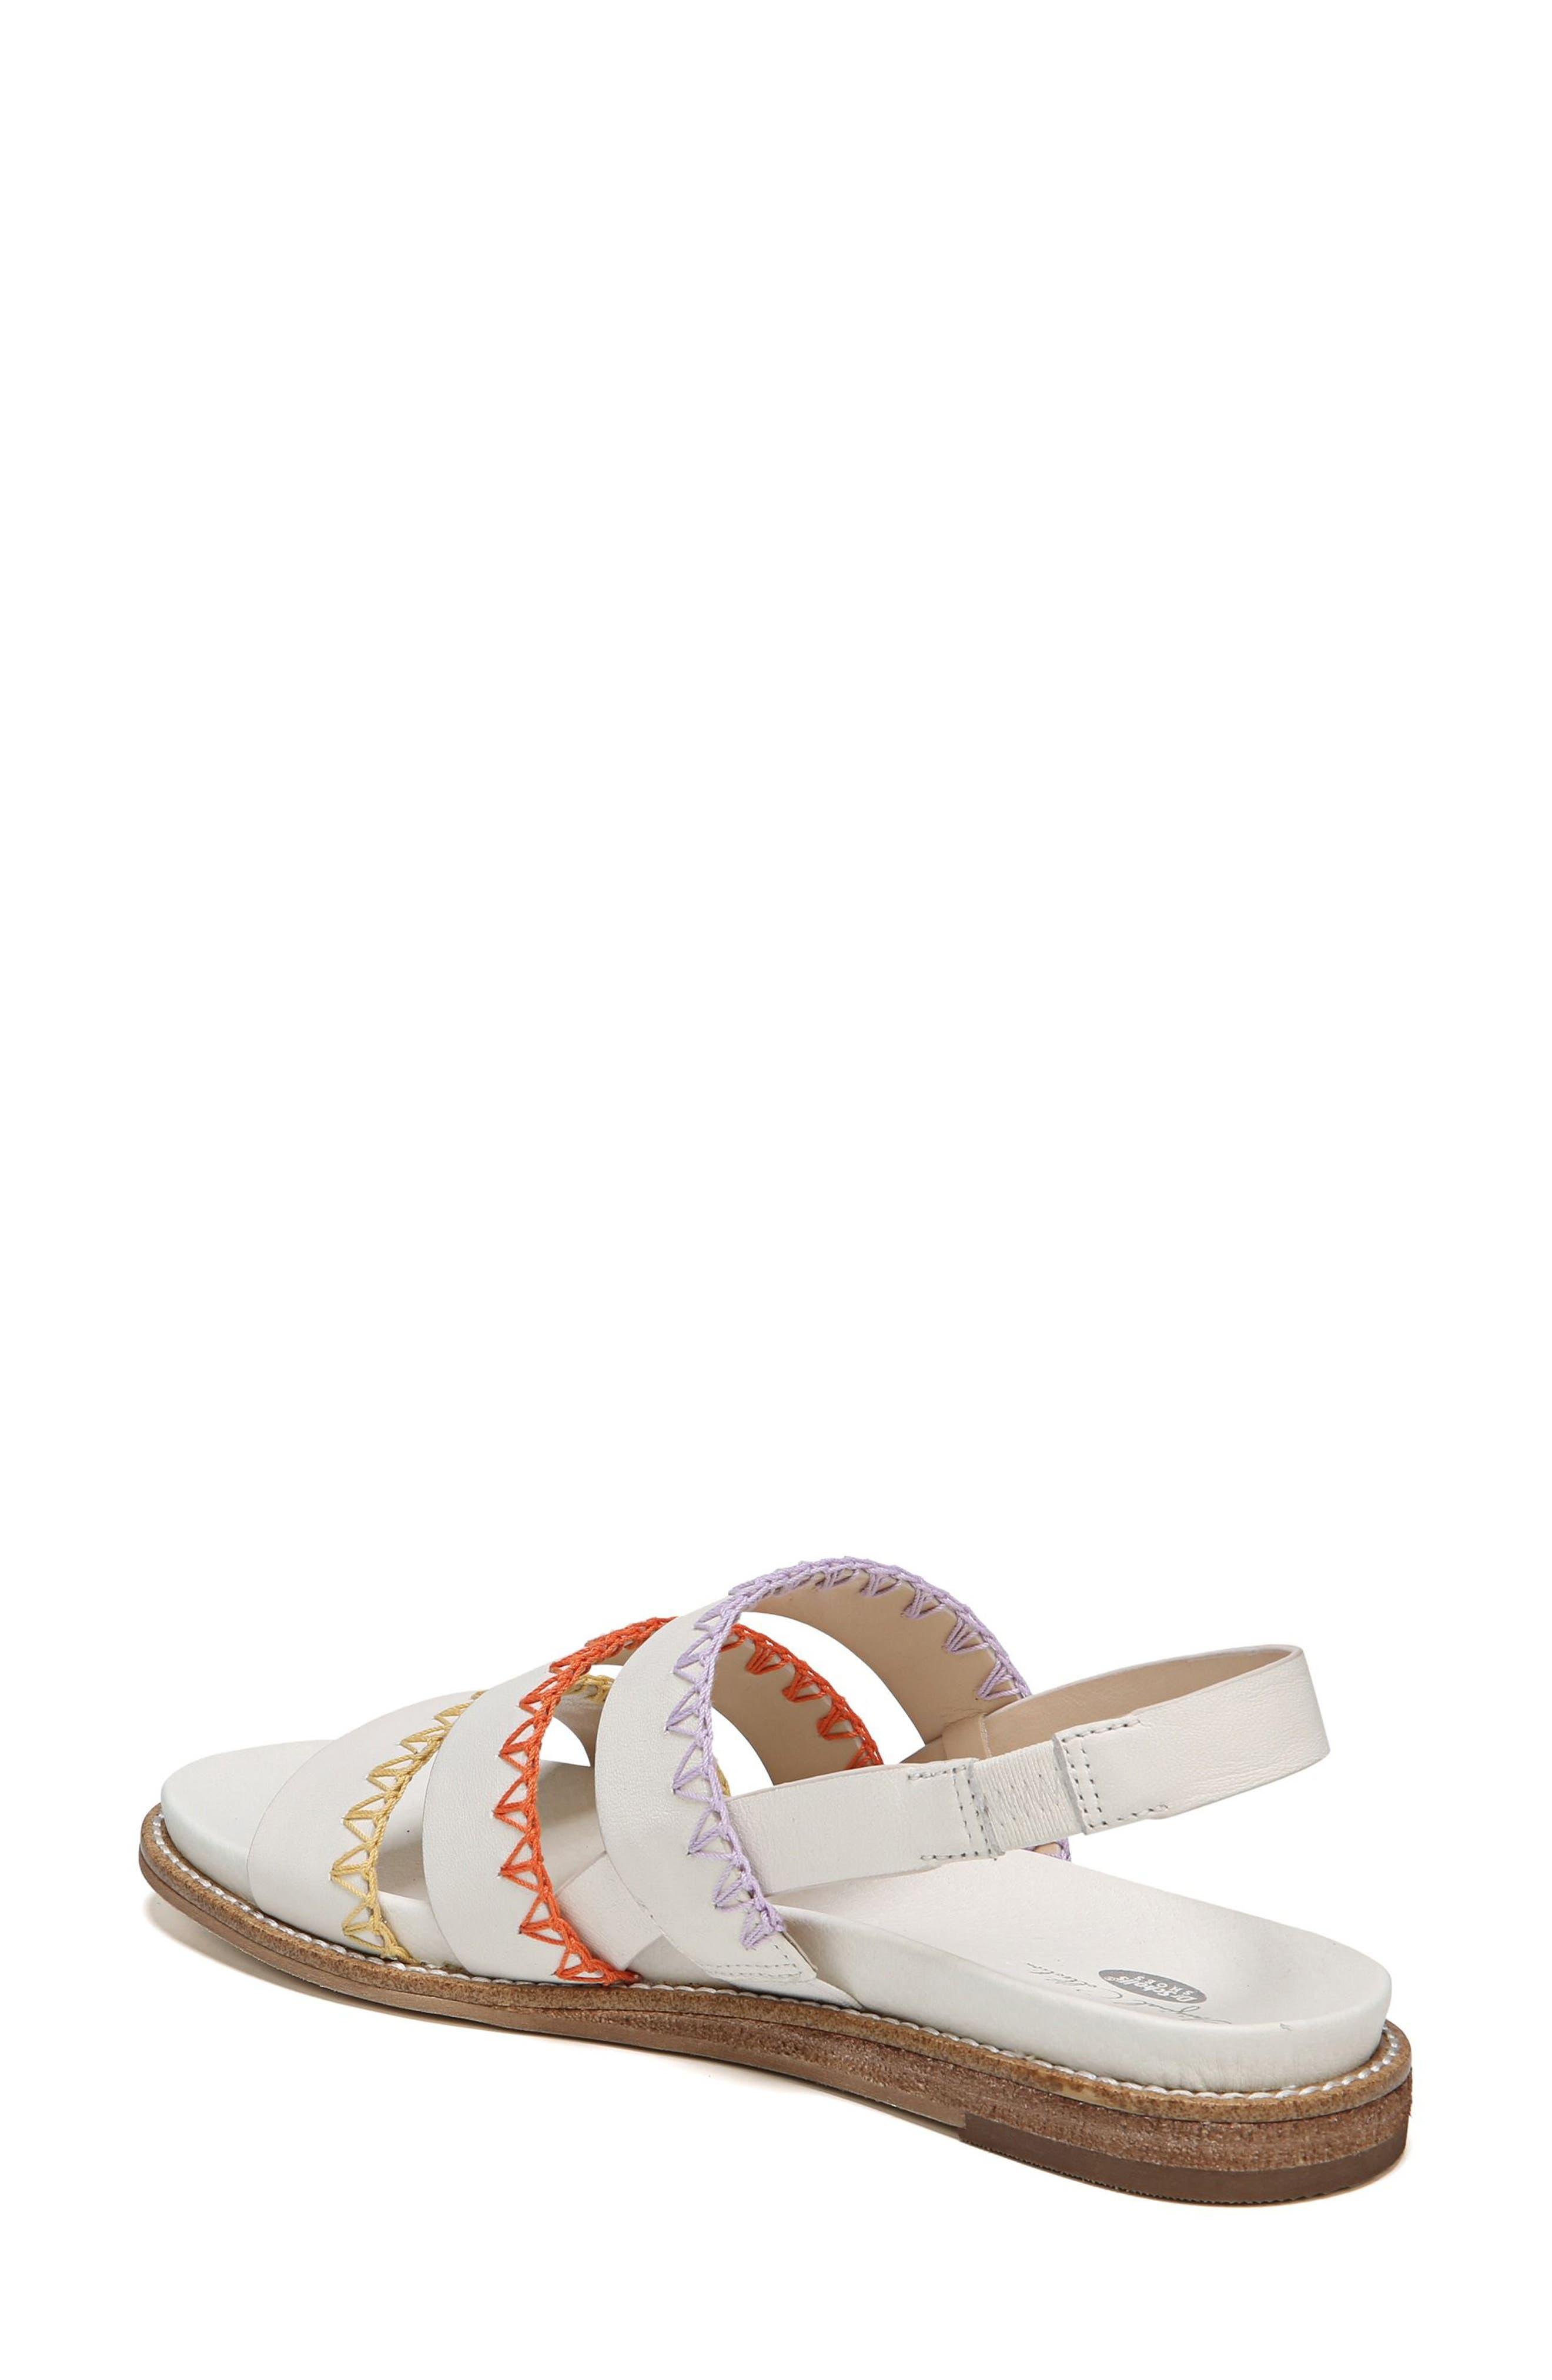 Discover Sandal,                             Alternate thumbnail 2, color,                             Marshmallow Leather